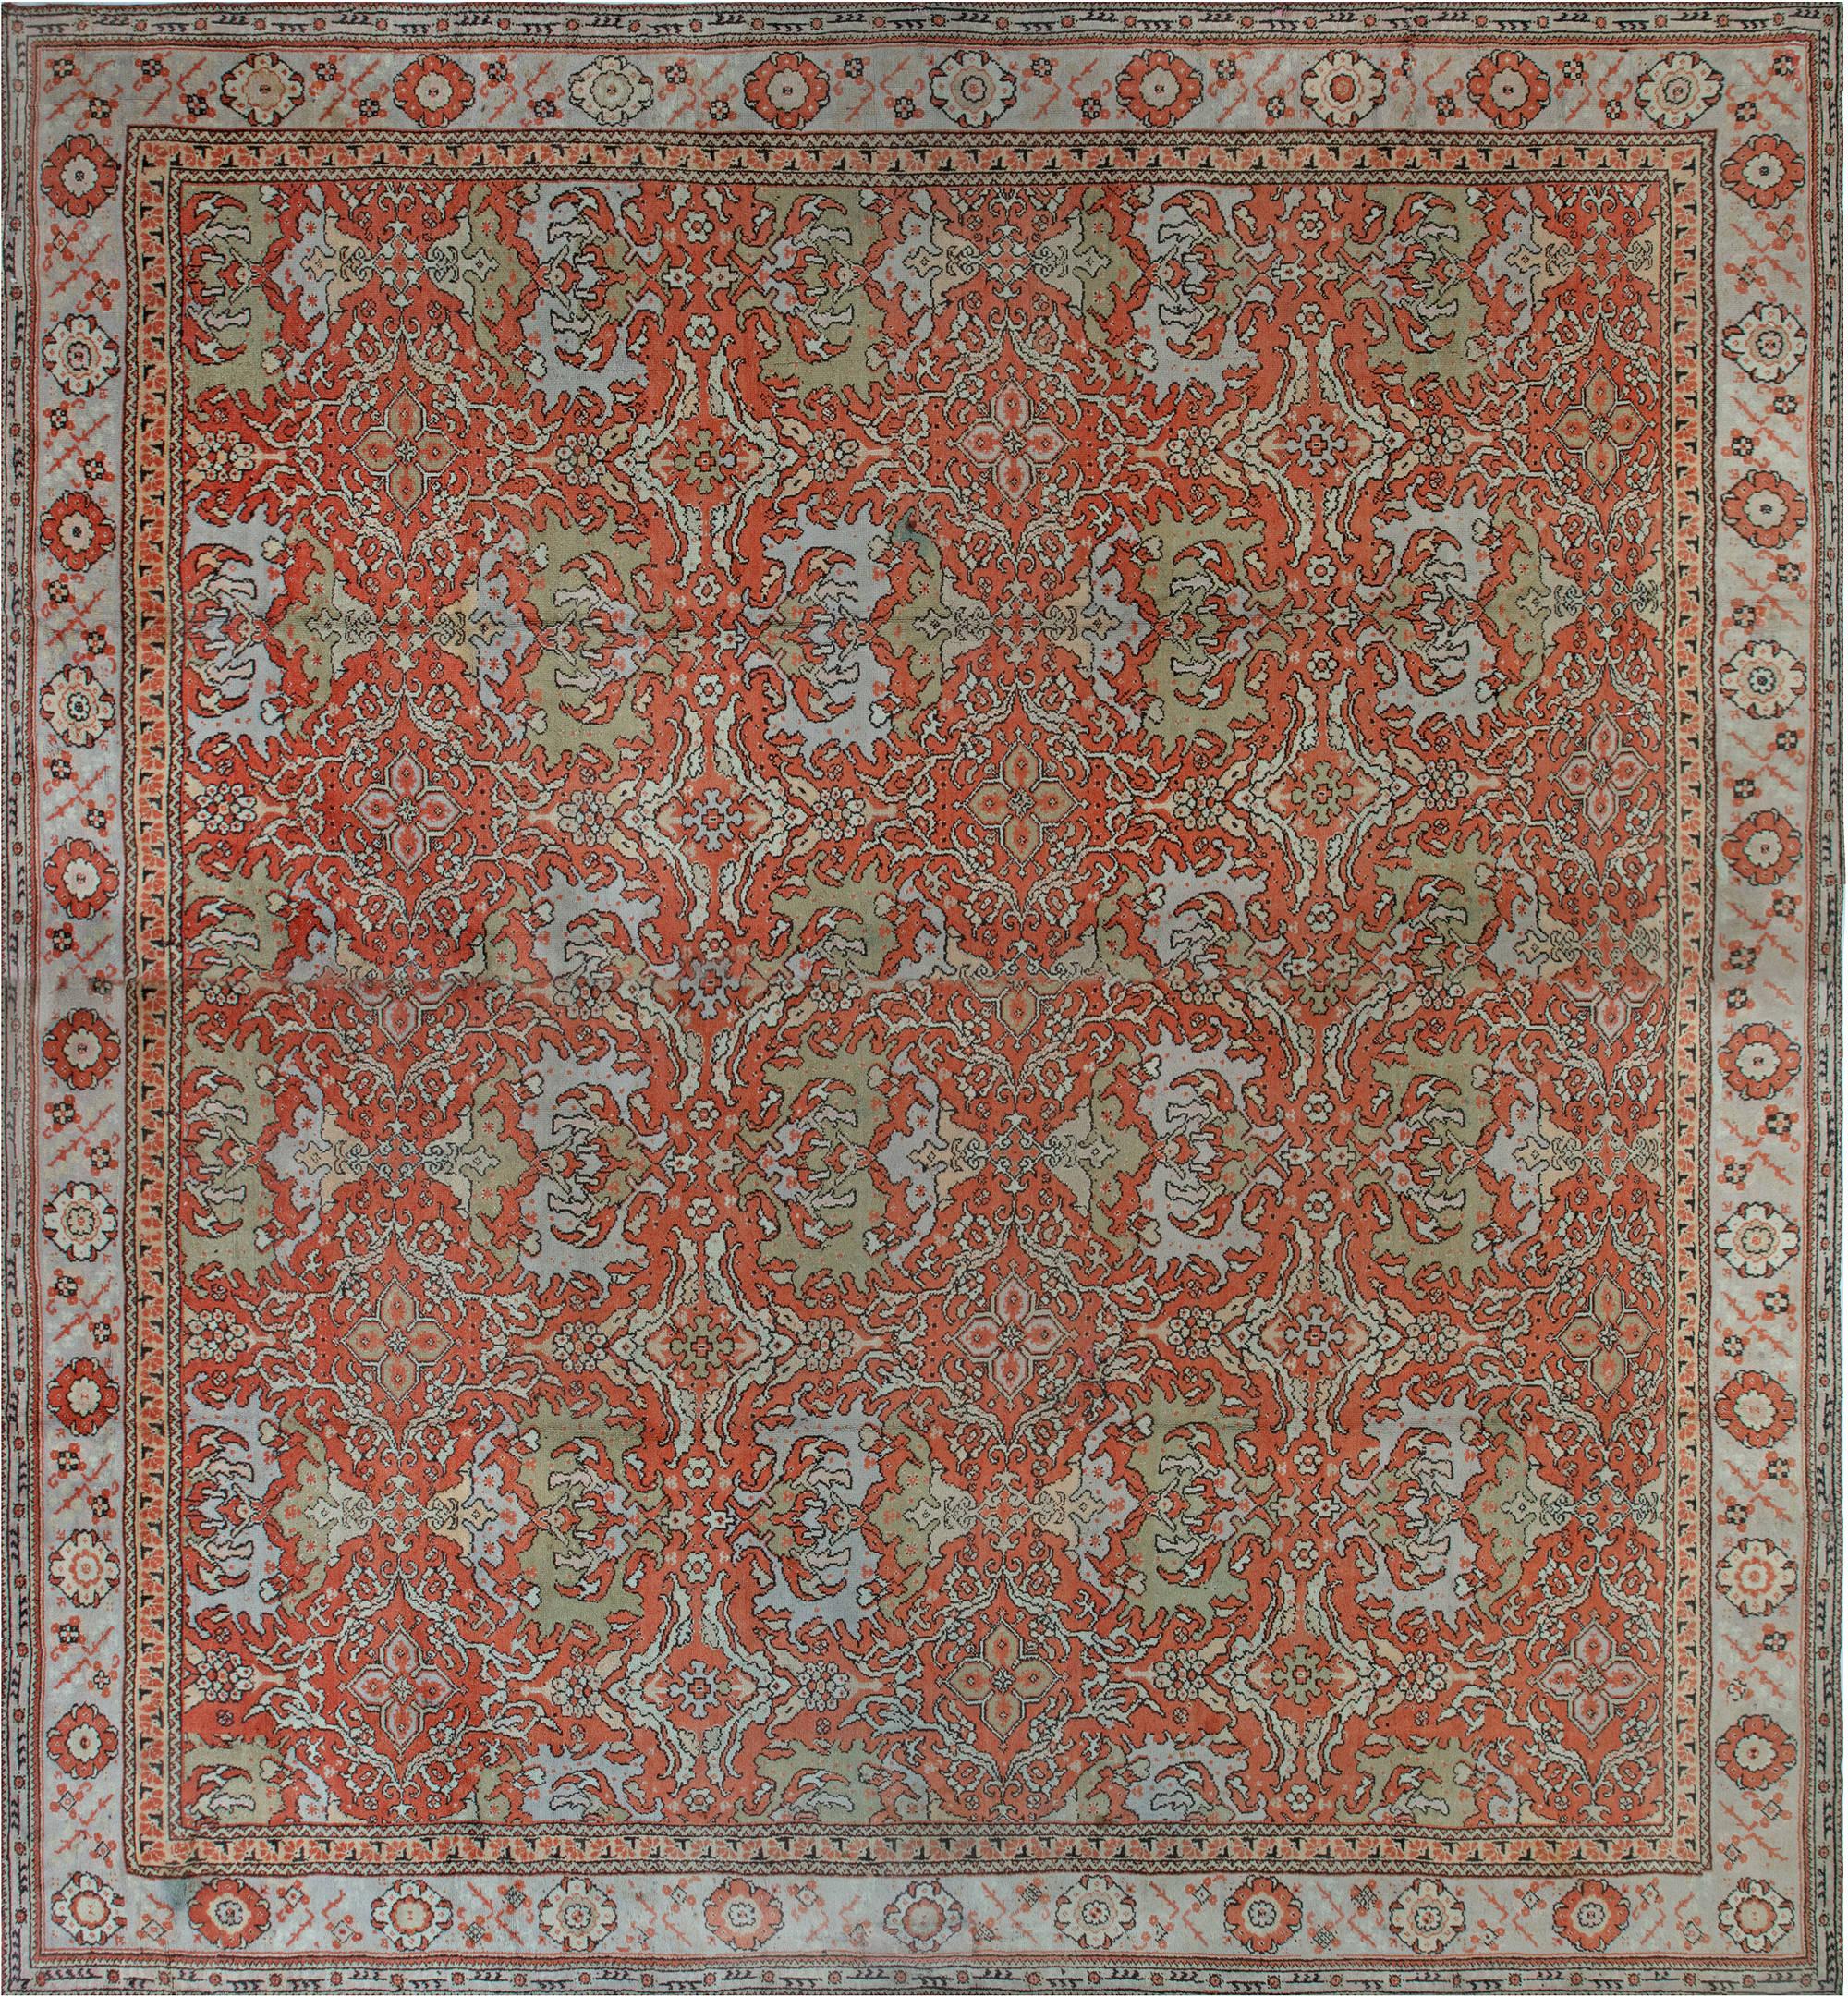 Oversized Vintage English Axminster Carpet BB1796